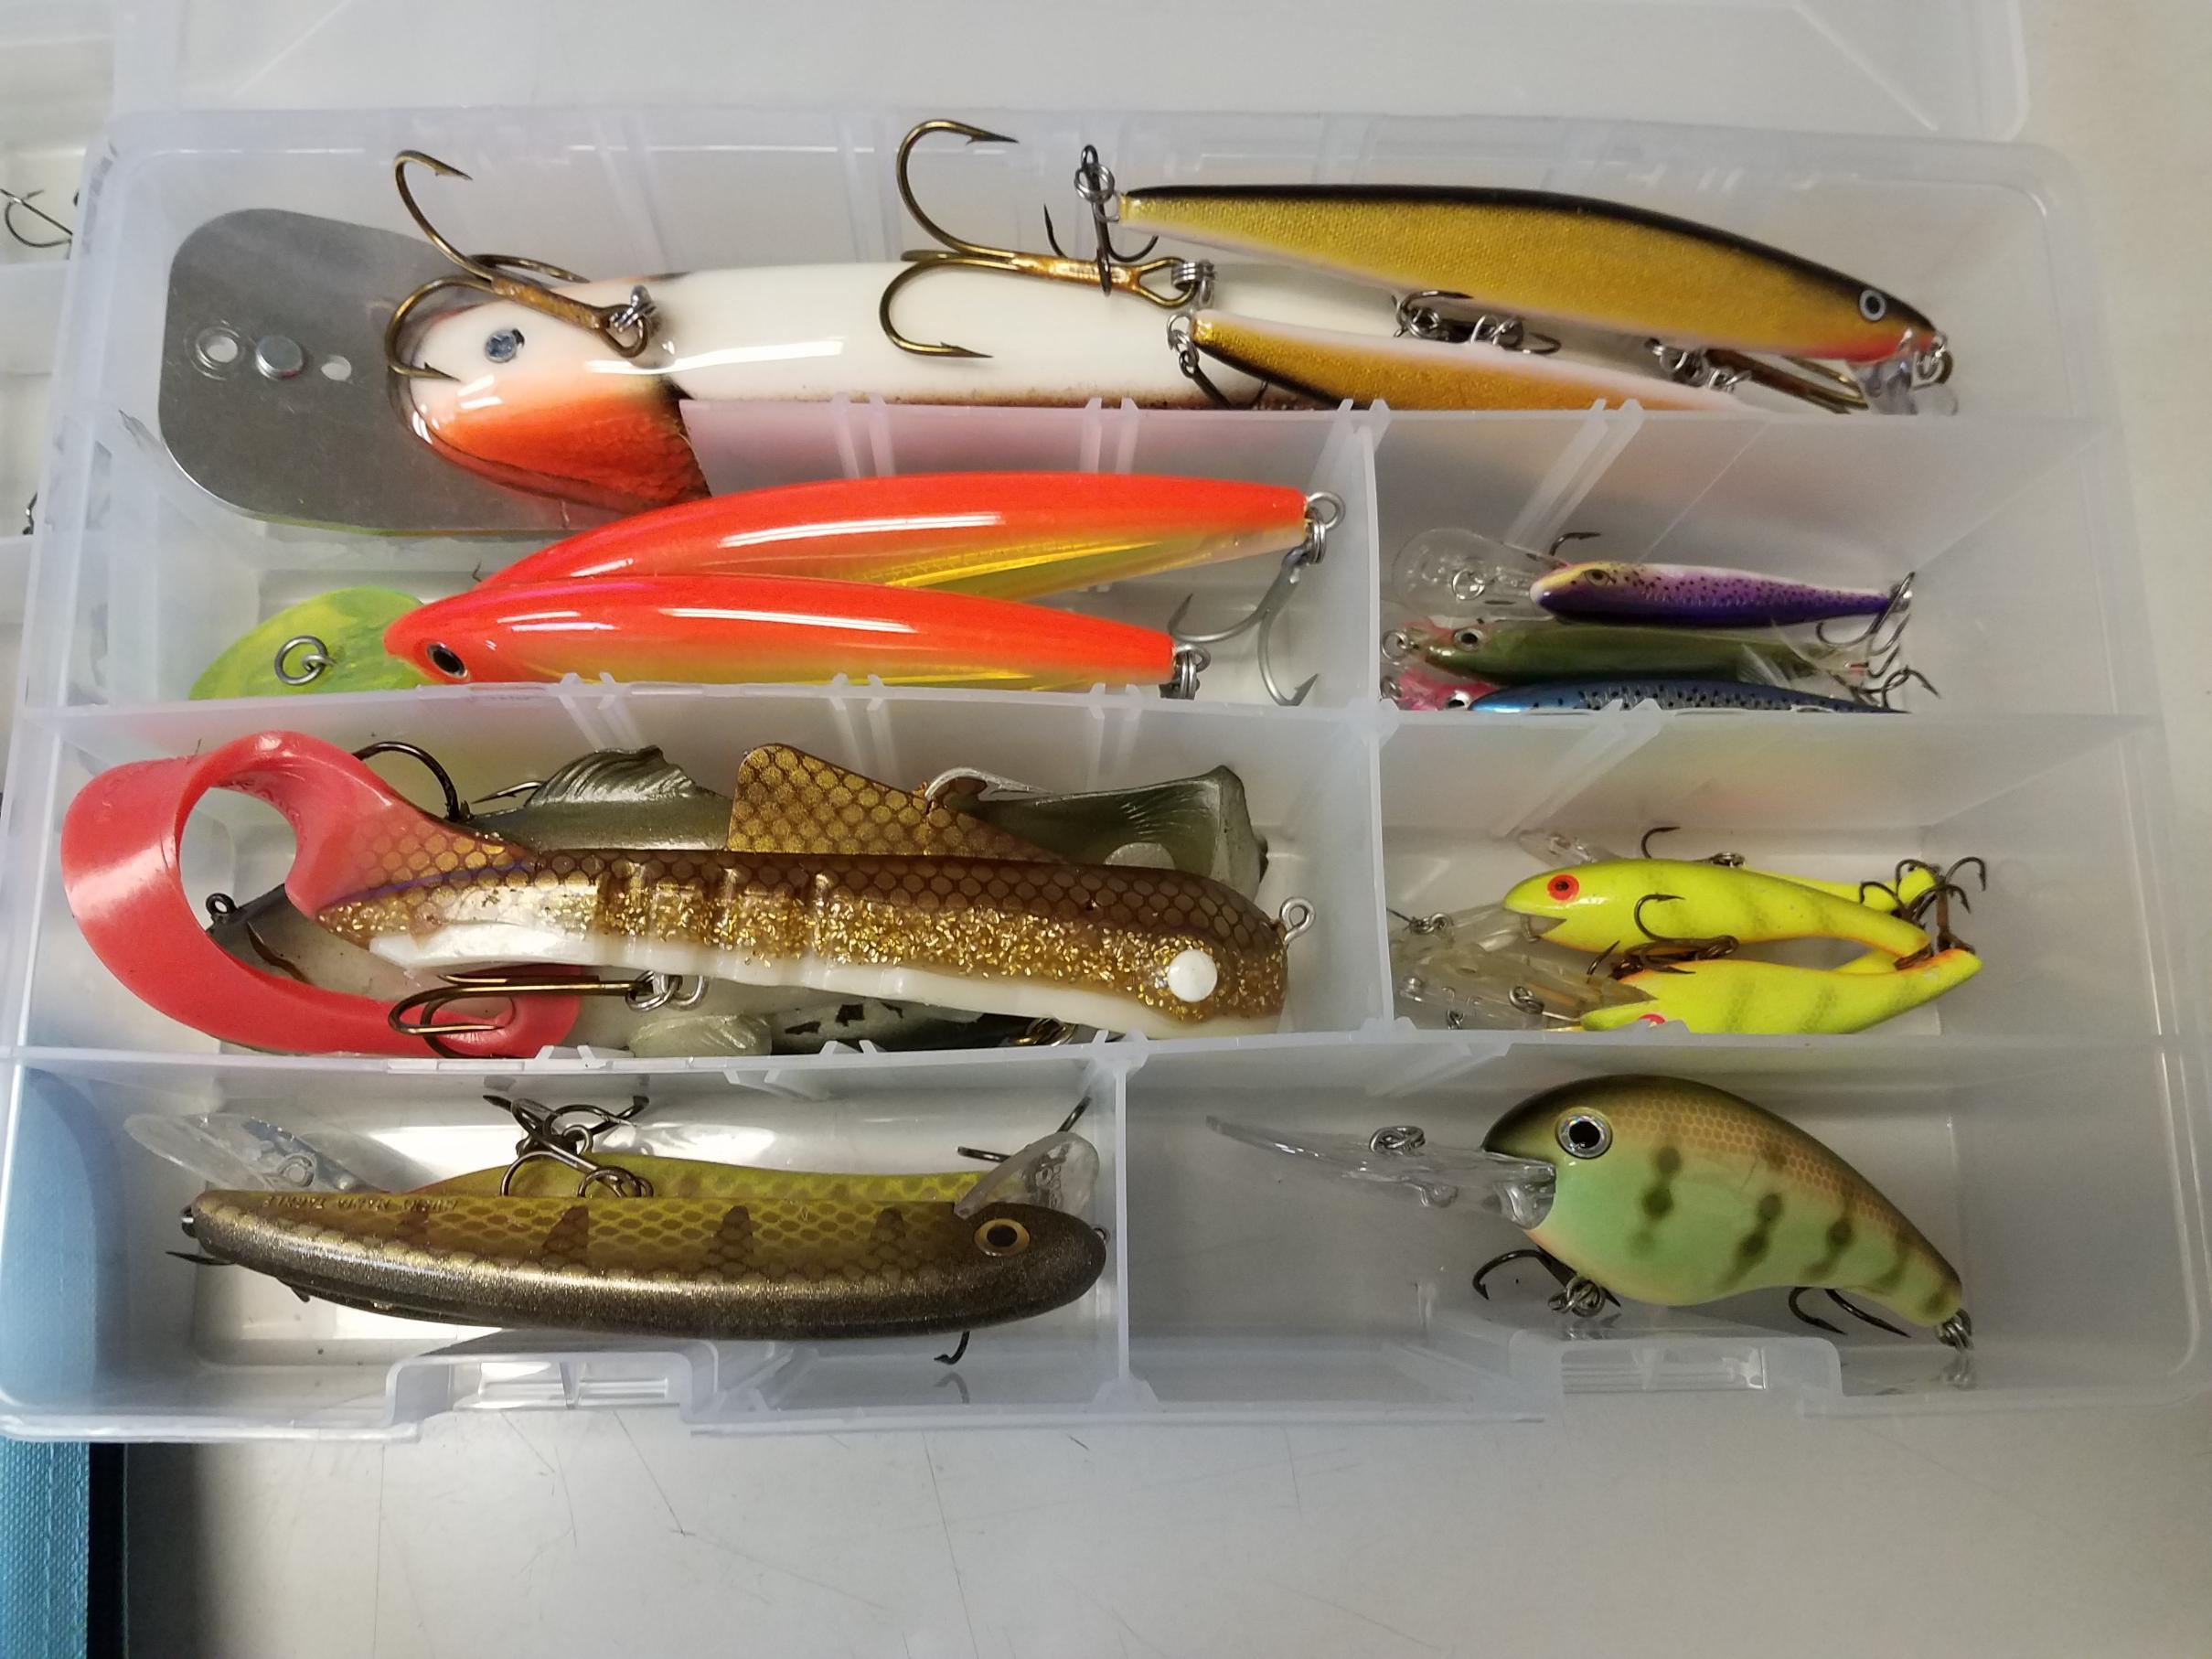 222×Hooks Swivels Carp Fishing Tackle Box  Safety Clips Tubing Set Ball Bearing